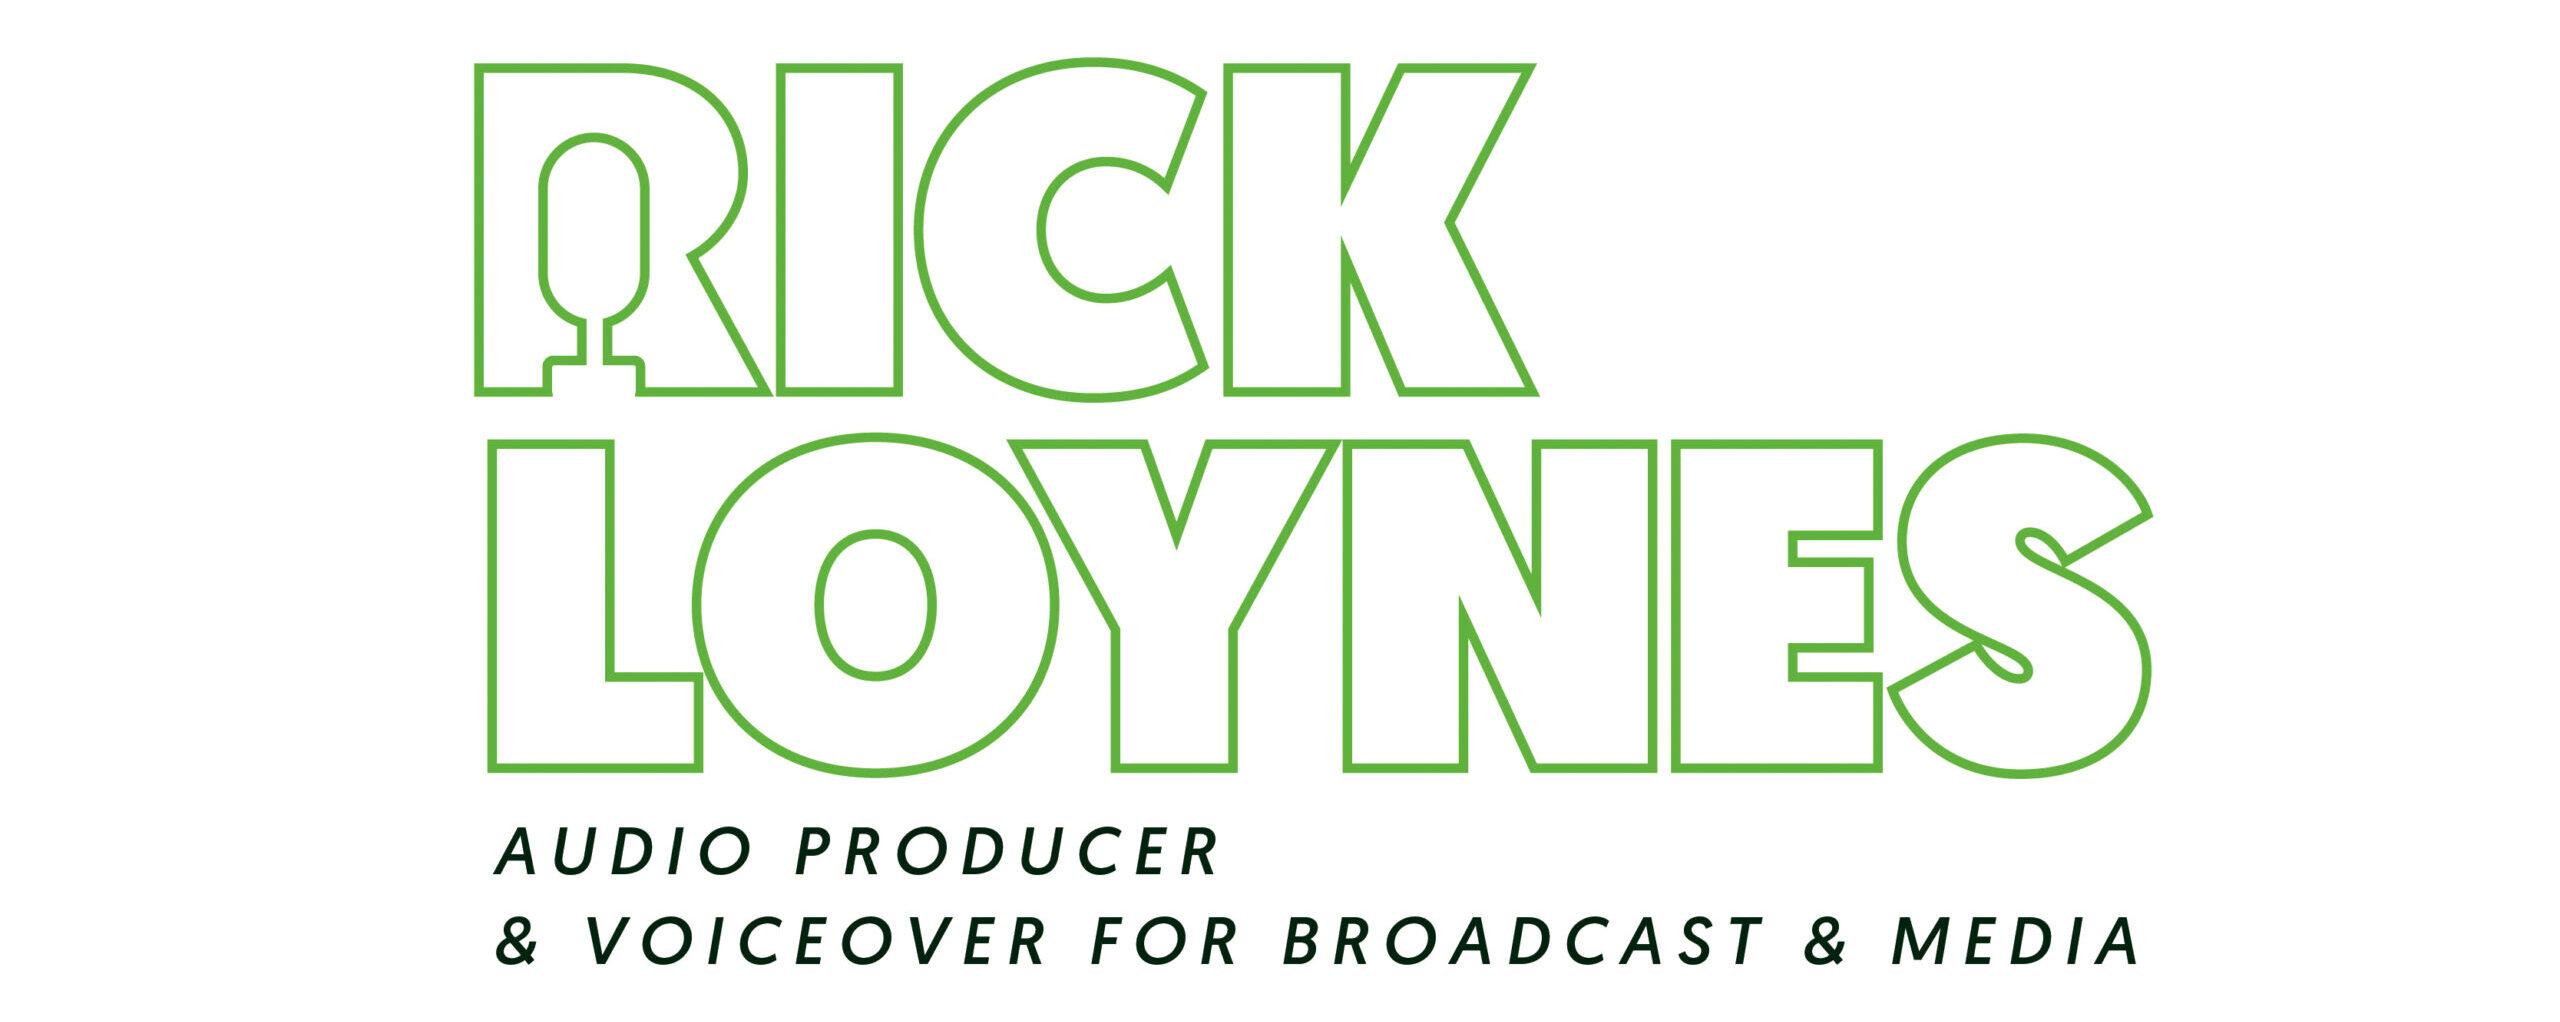 Rick Loynes | Audio Production & Voiceover